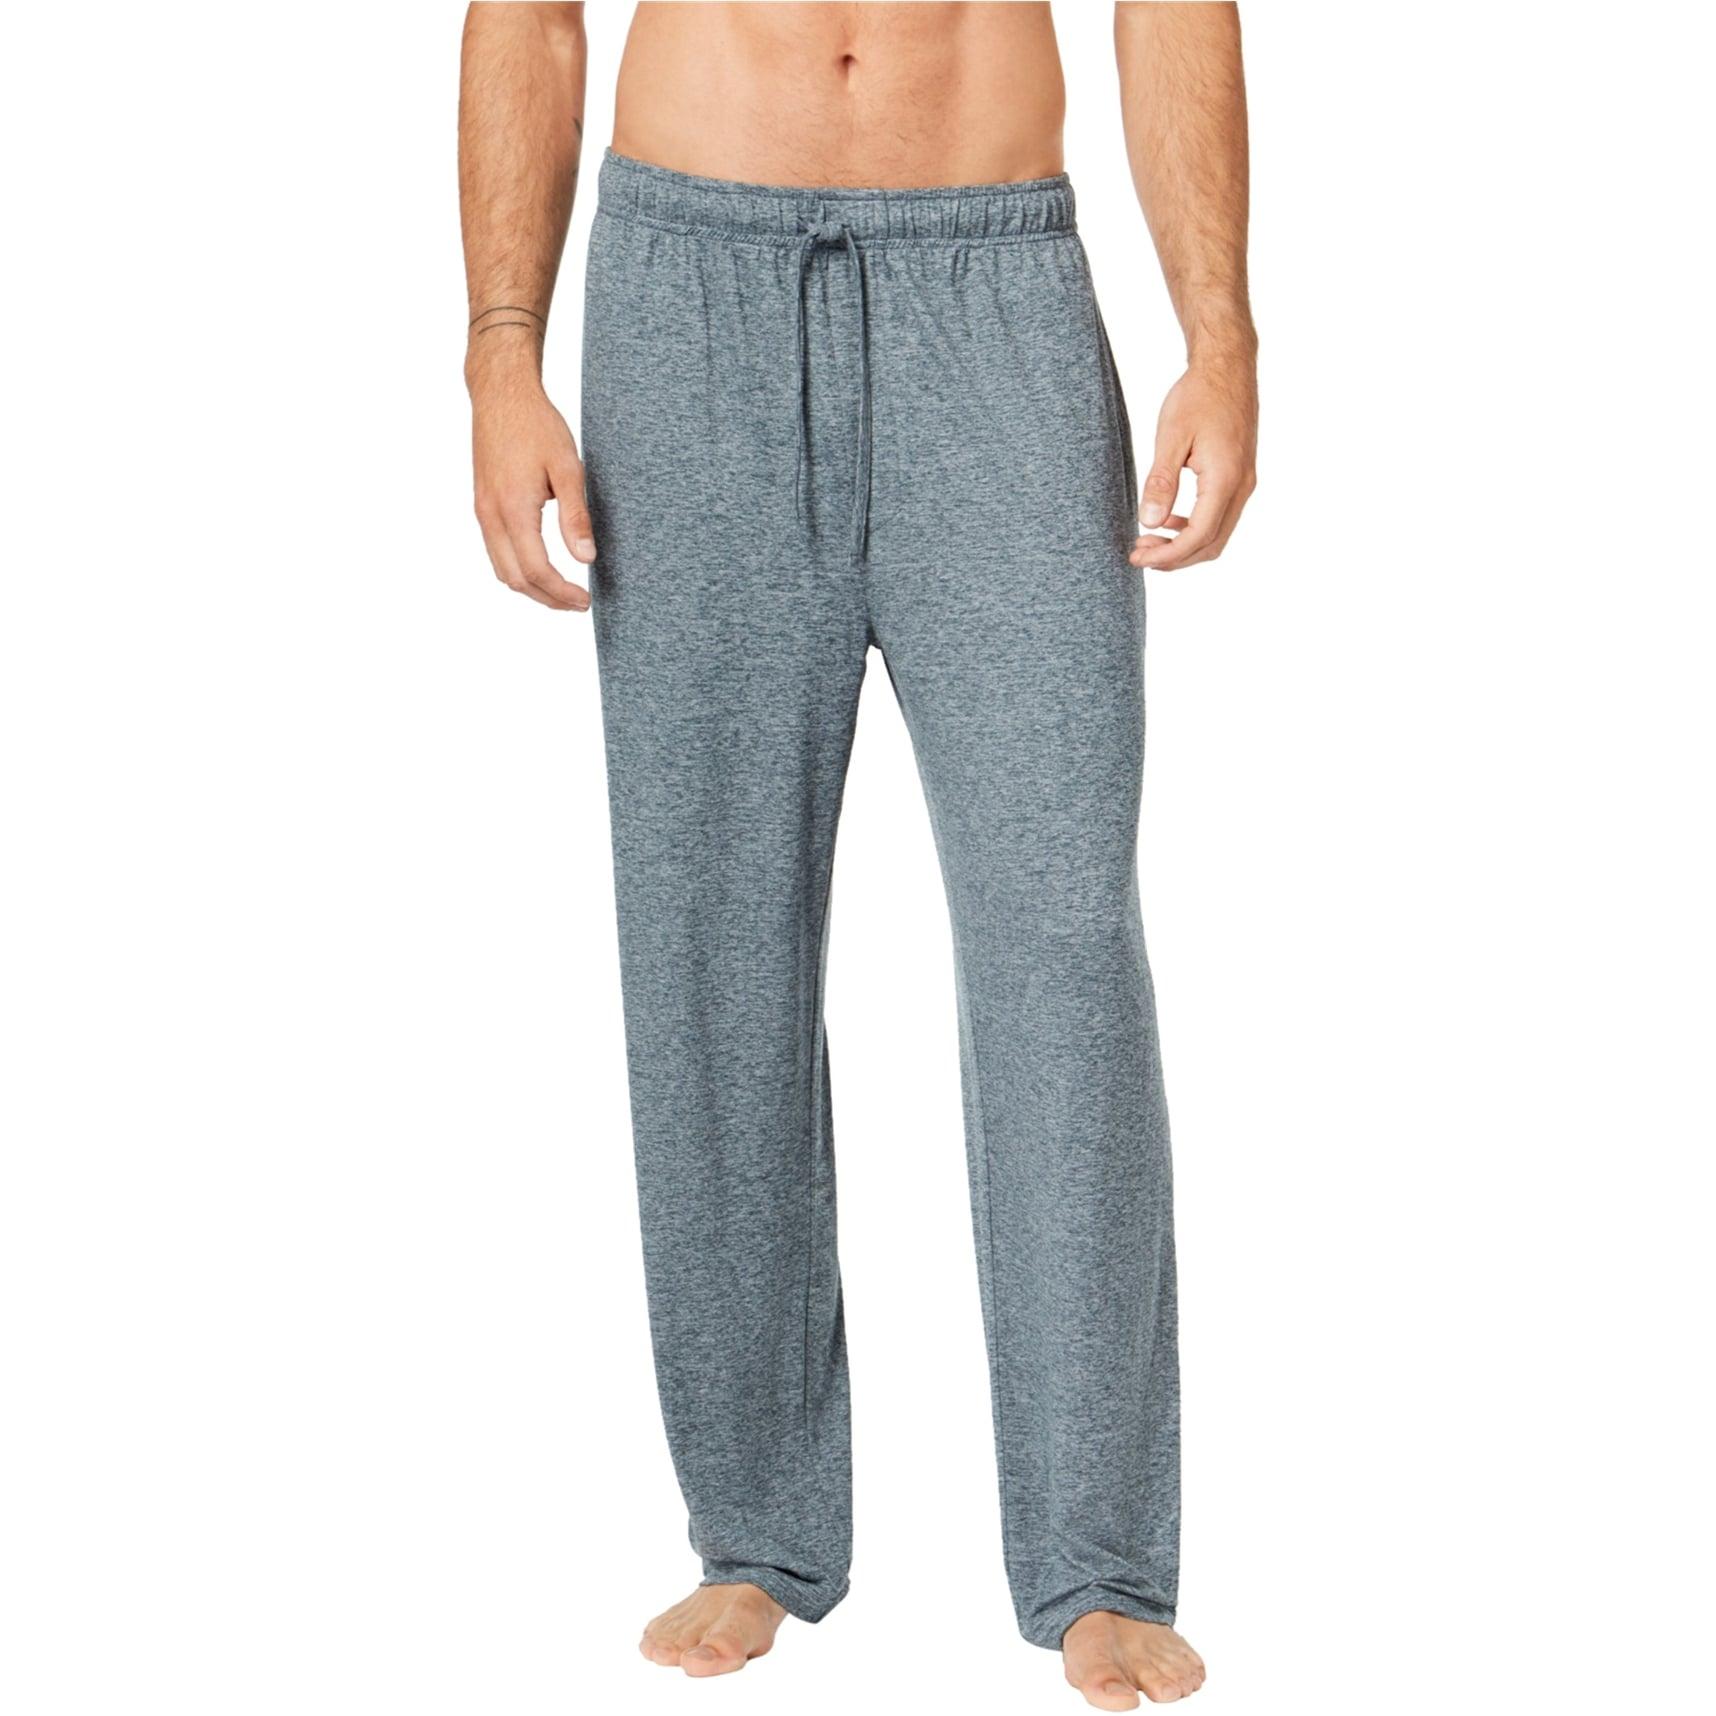 NEW Mens Lounge Pants Size Large Joggers Pajamas Sleepwear Pockets PJs Gray